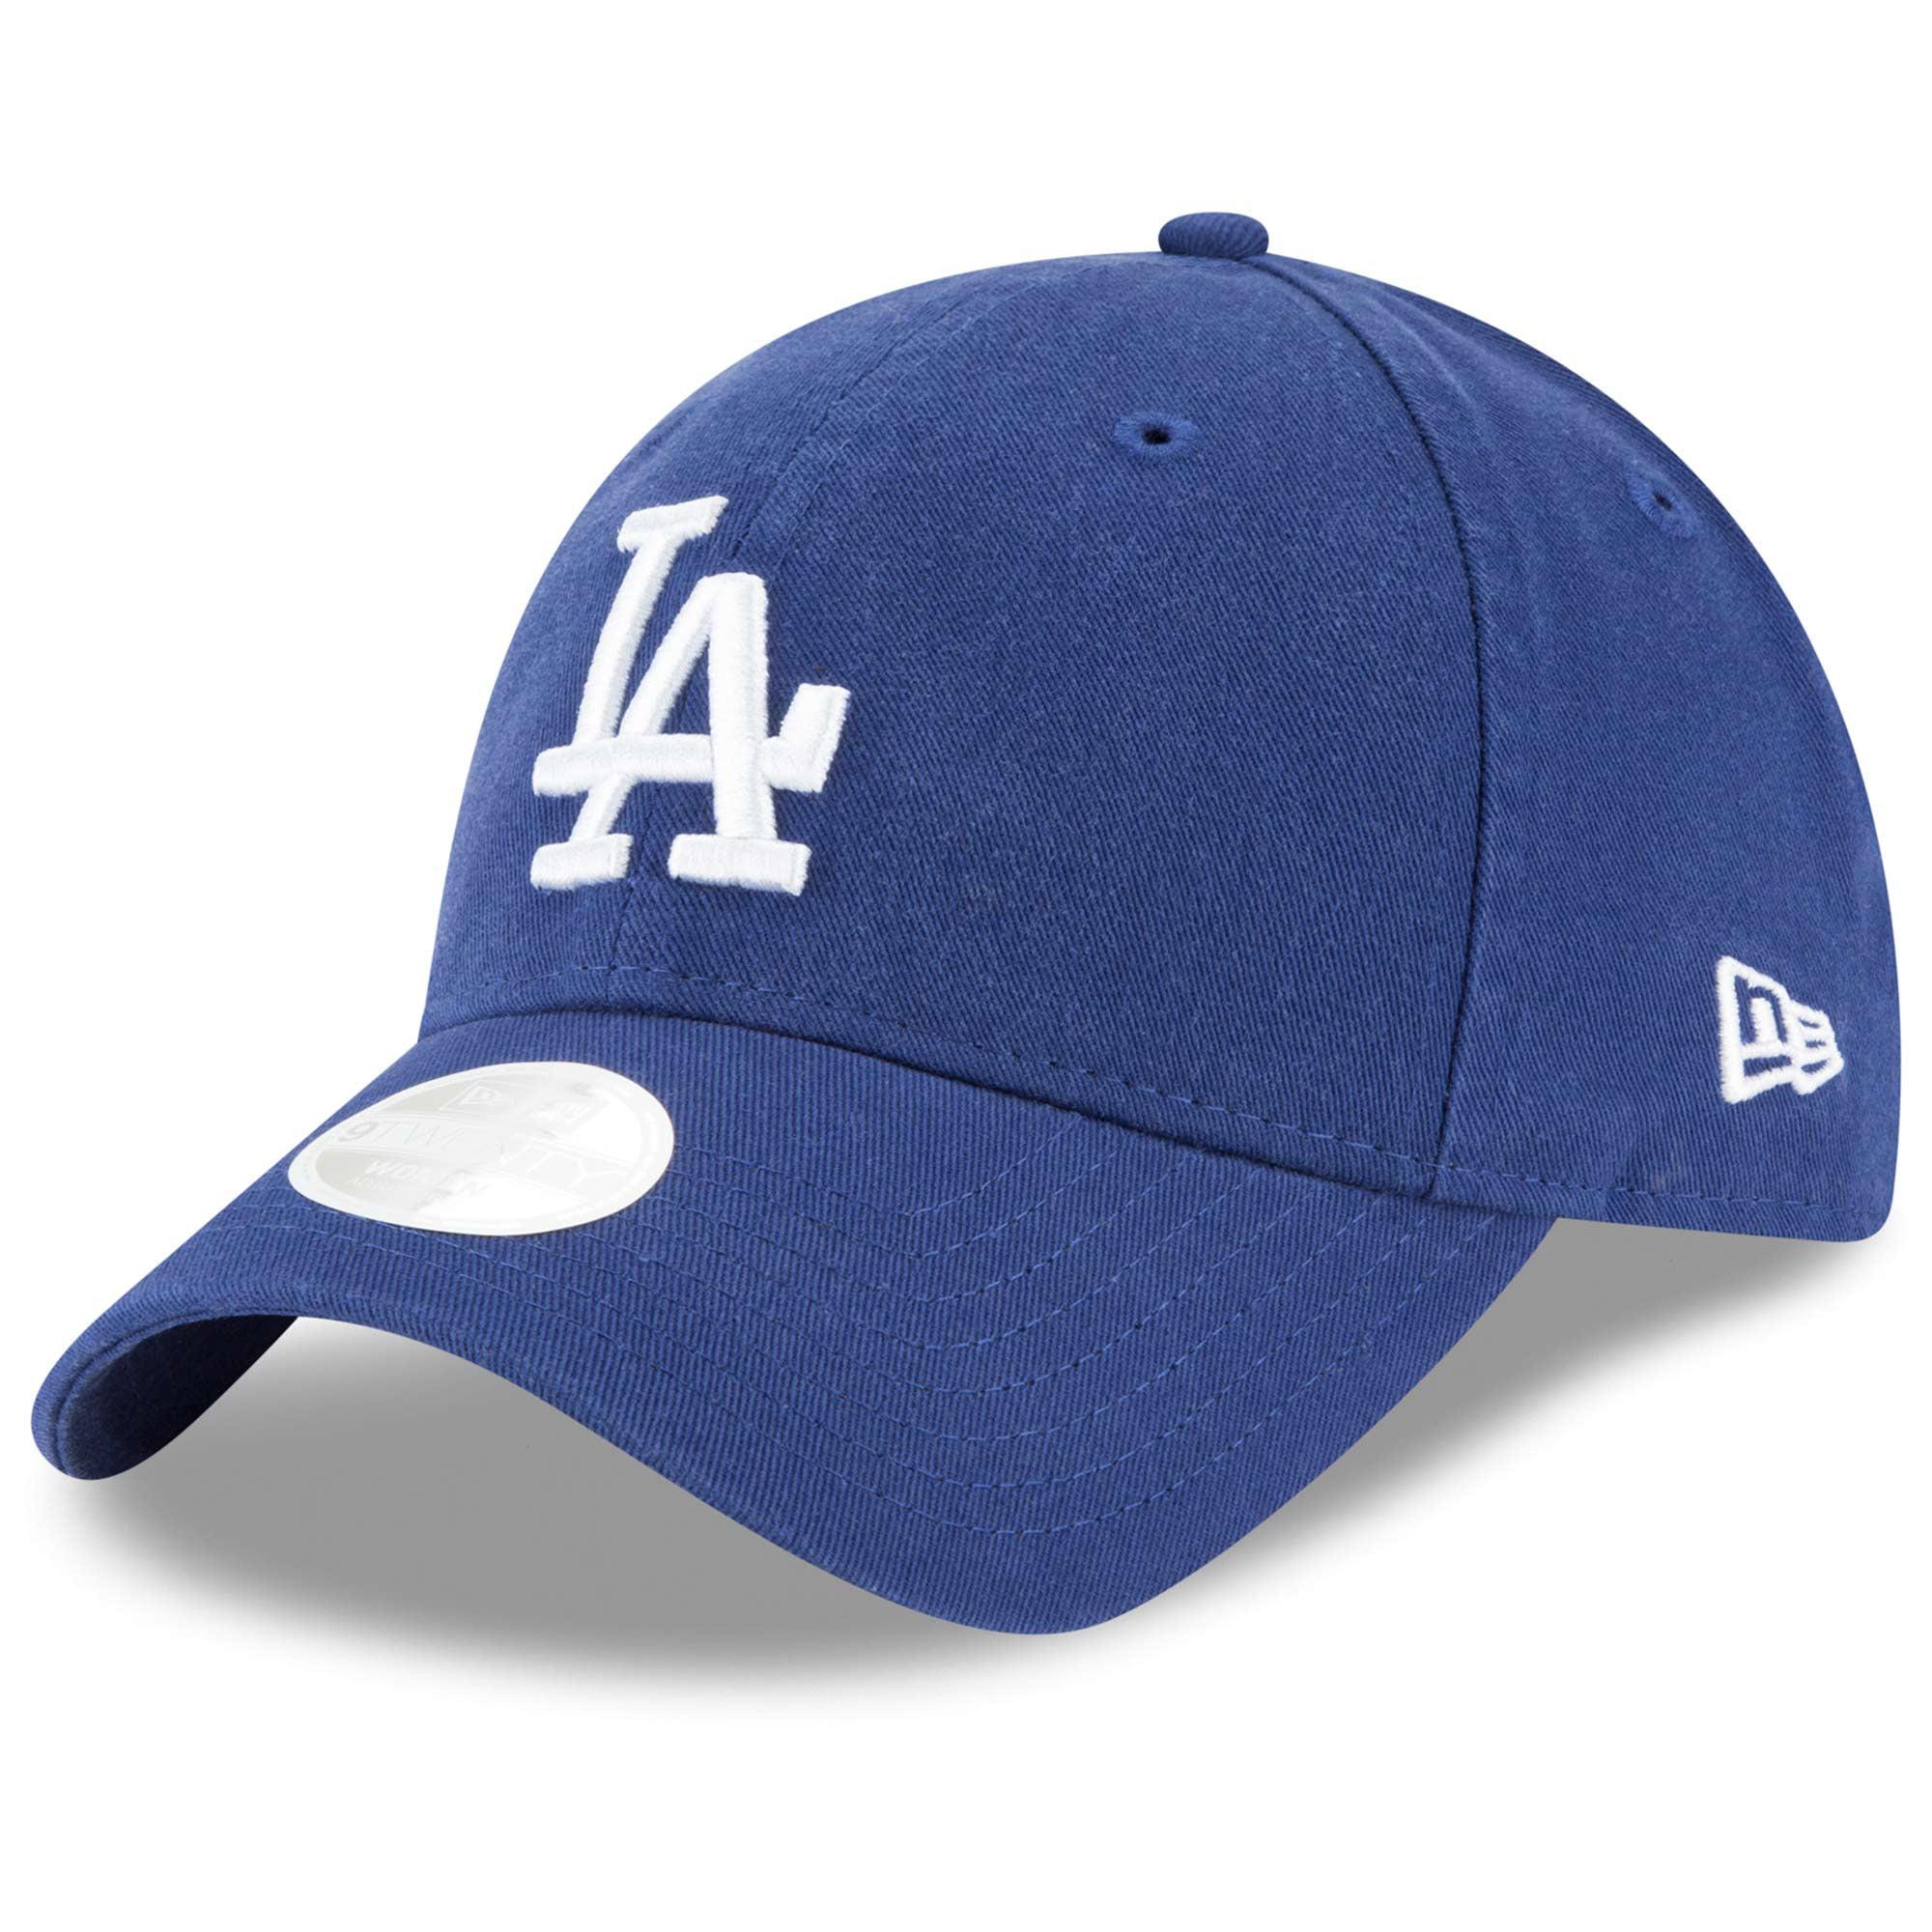 Los Angeles Dodgers New Era Women's Logo Core Classic Twill Team Color 9TWENTY Adjustable Hat - Royal - OSFA